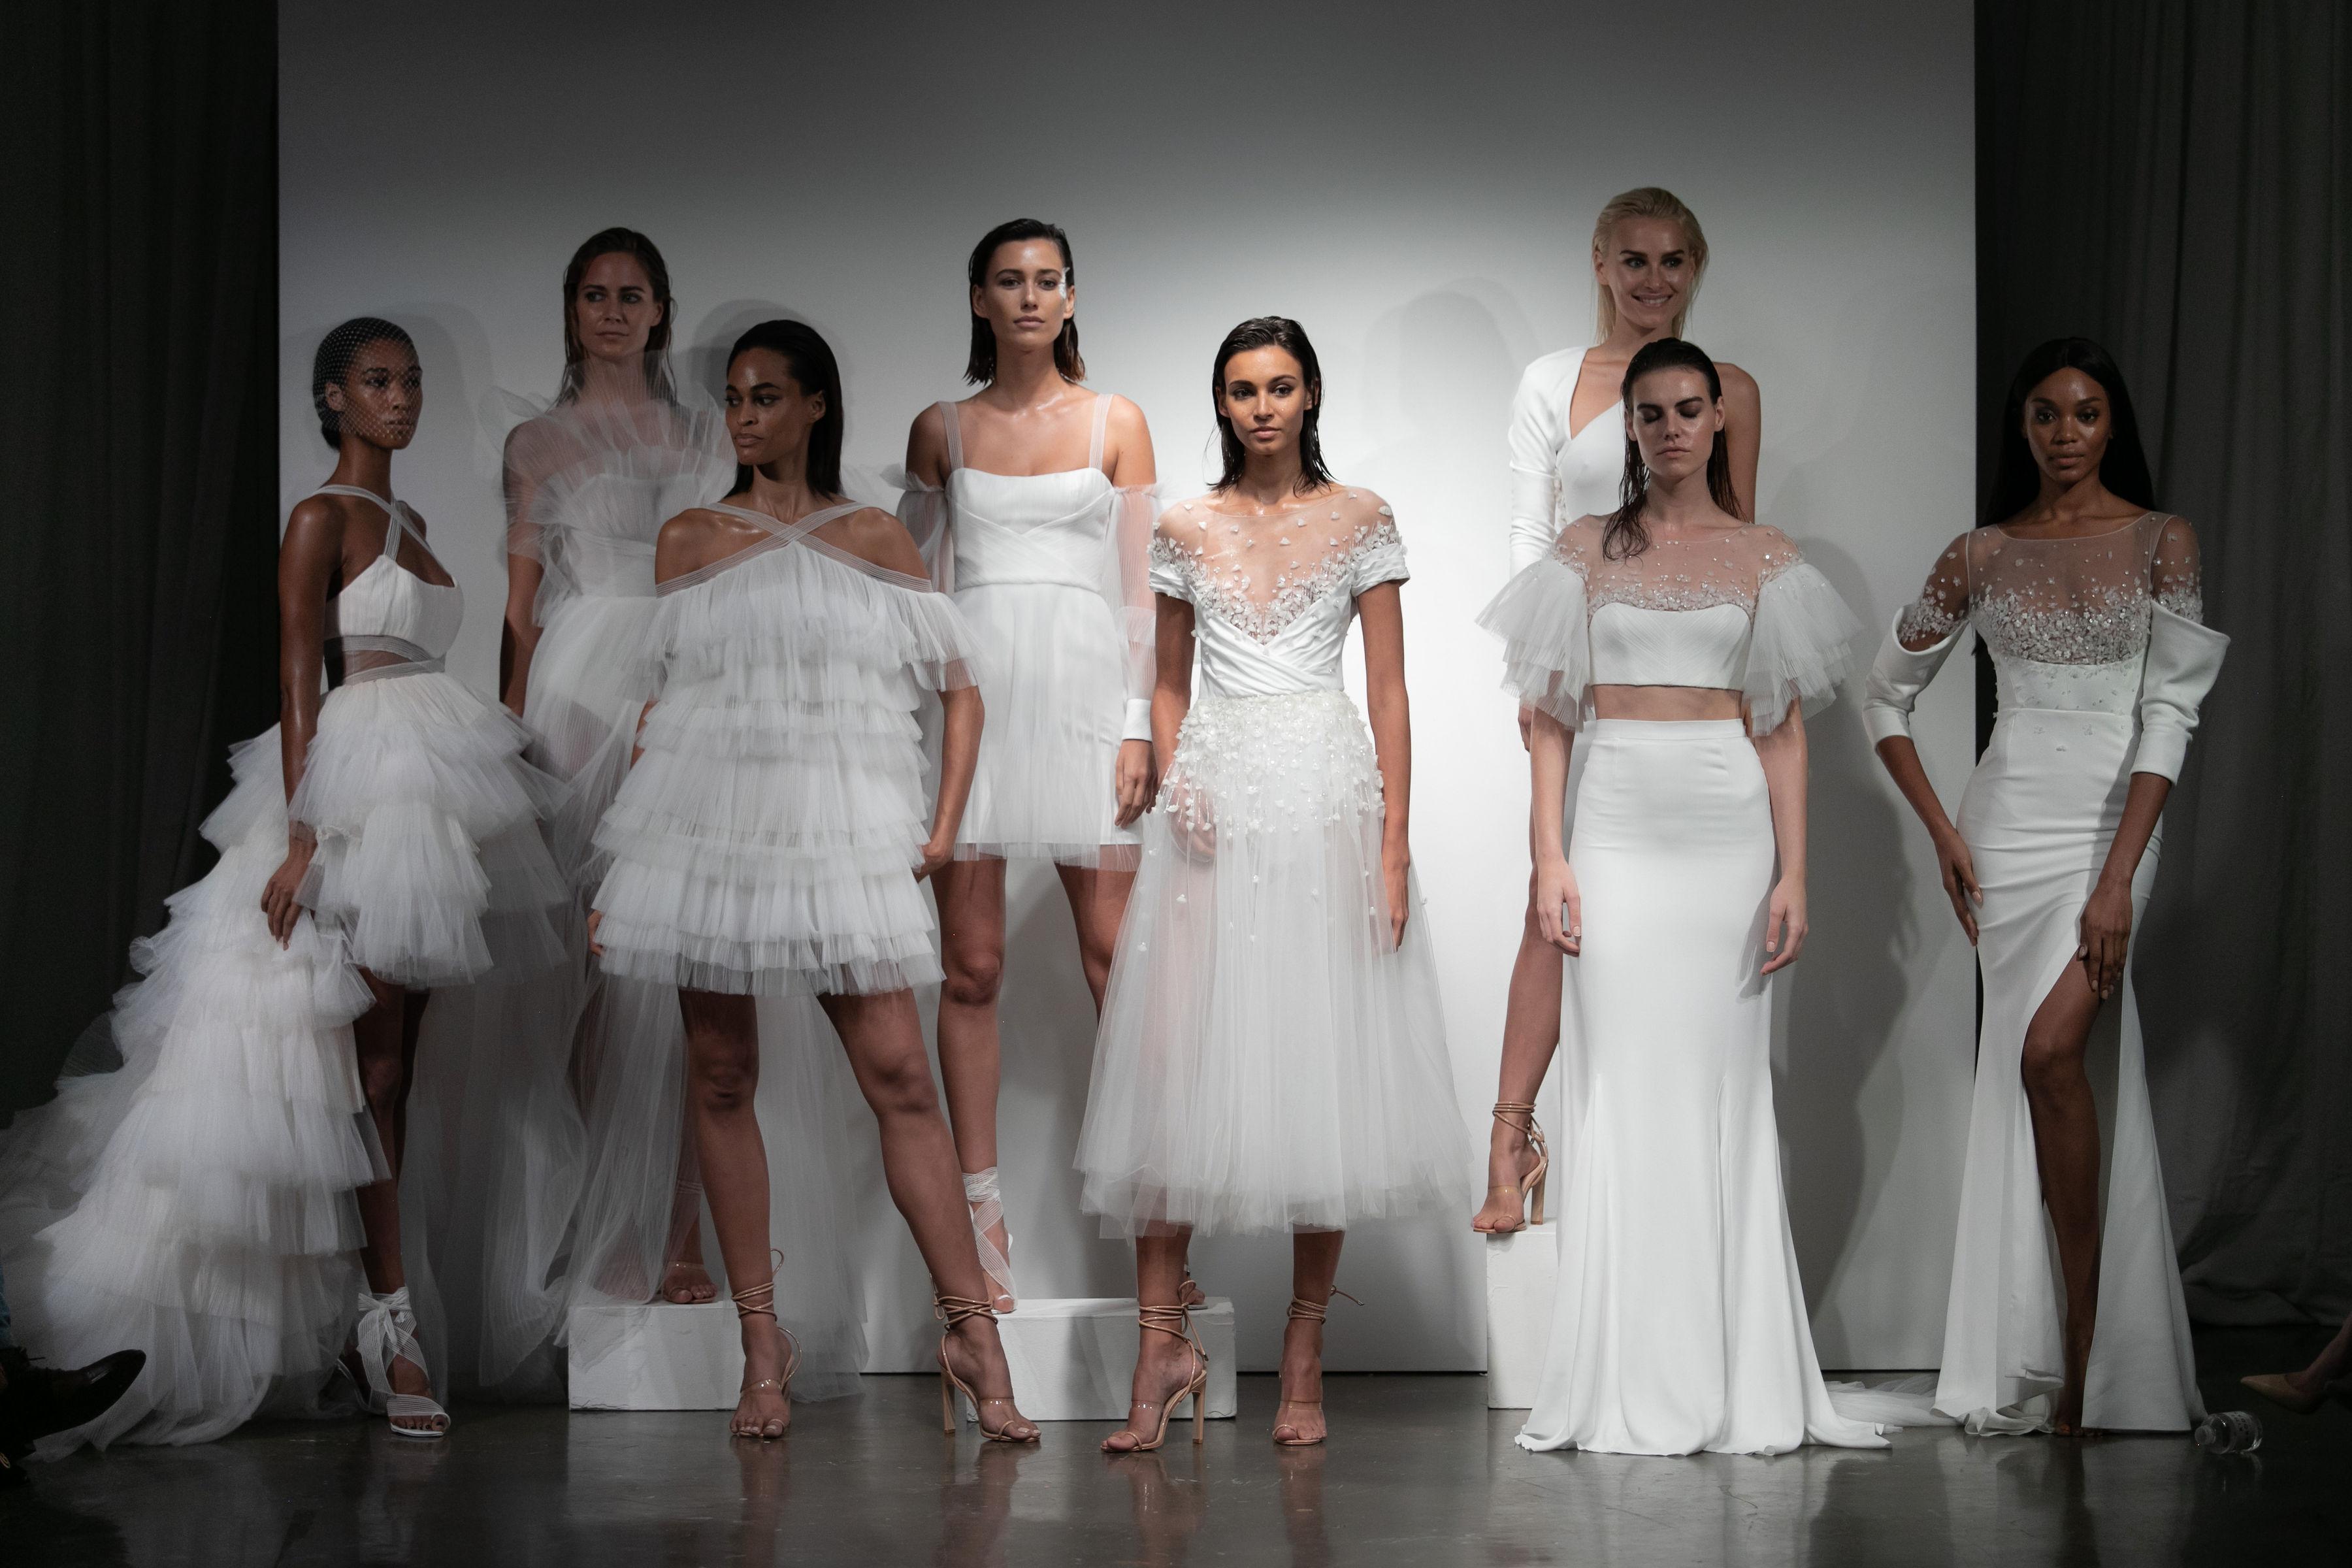 Top 10 Best Wedding Dress Designers In 2019: The Top 10 Best Dresses From Rime Arodaky's Spring 2019